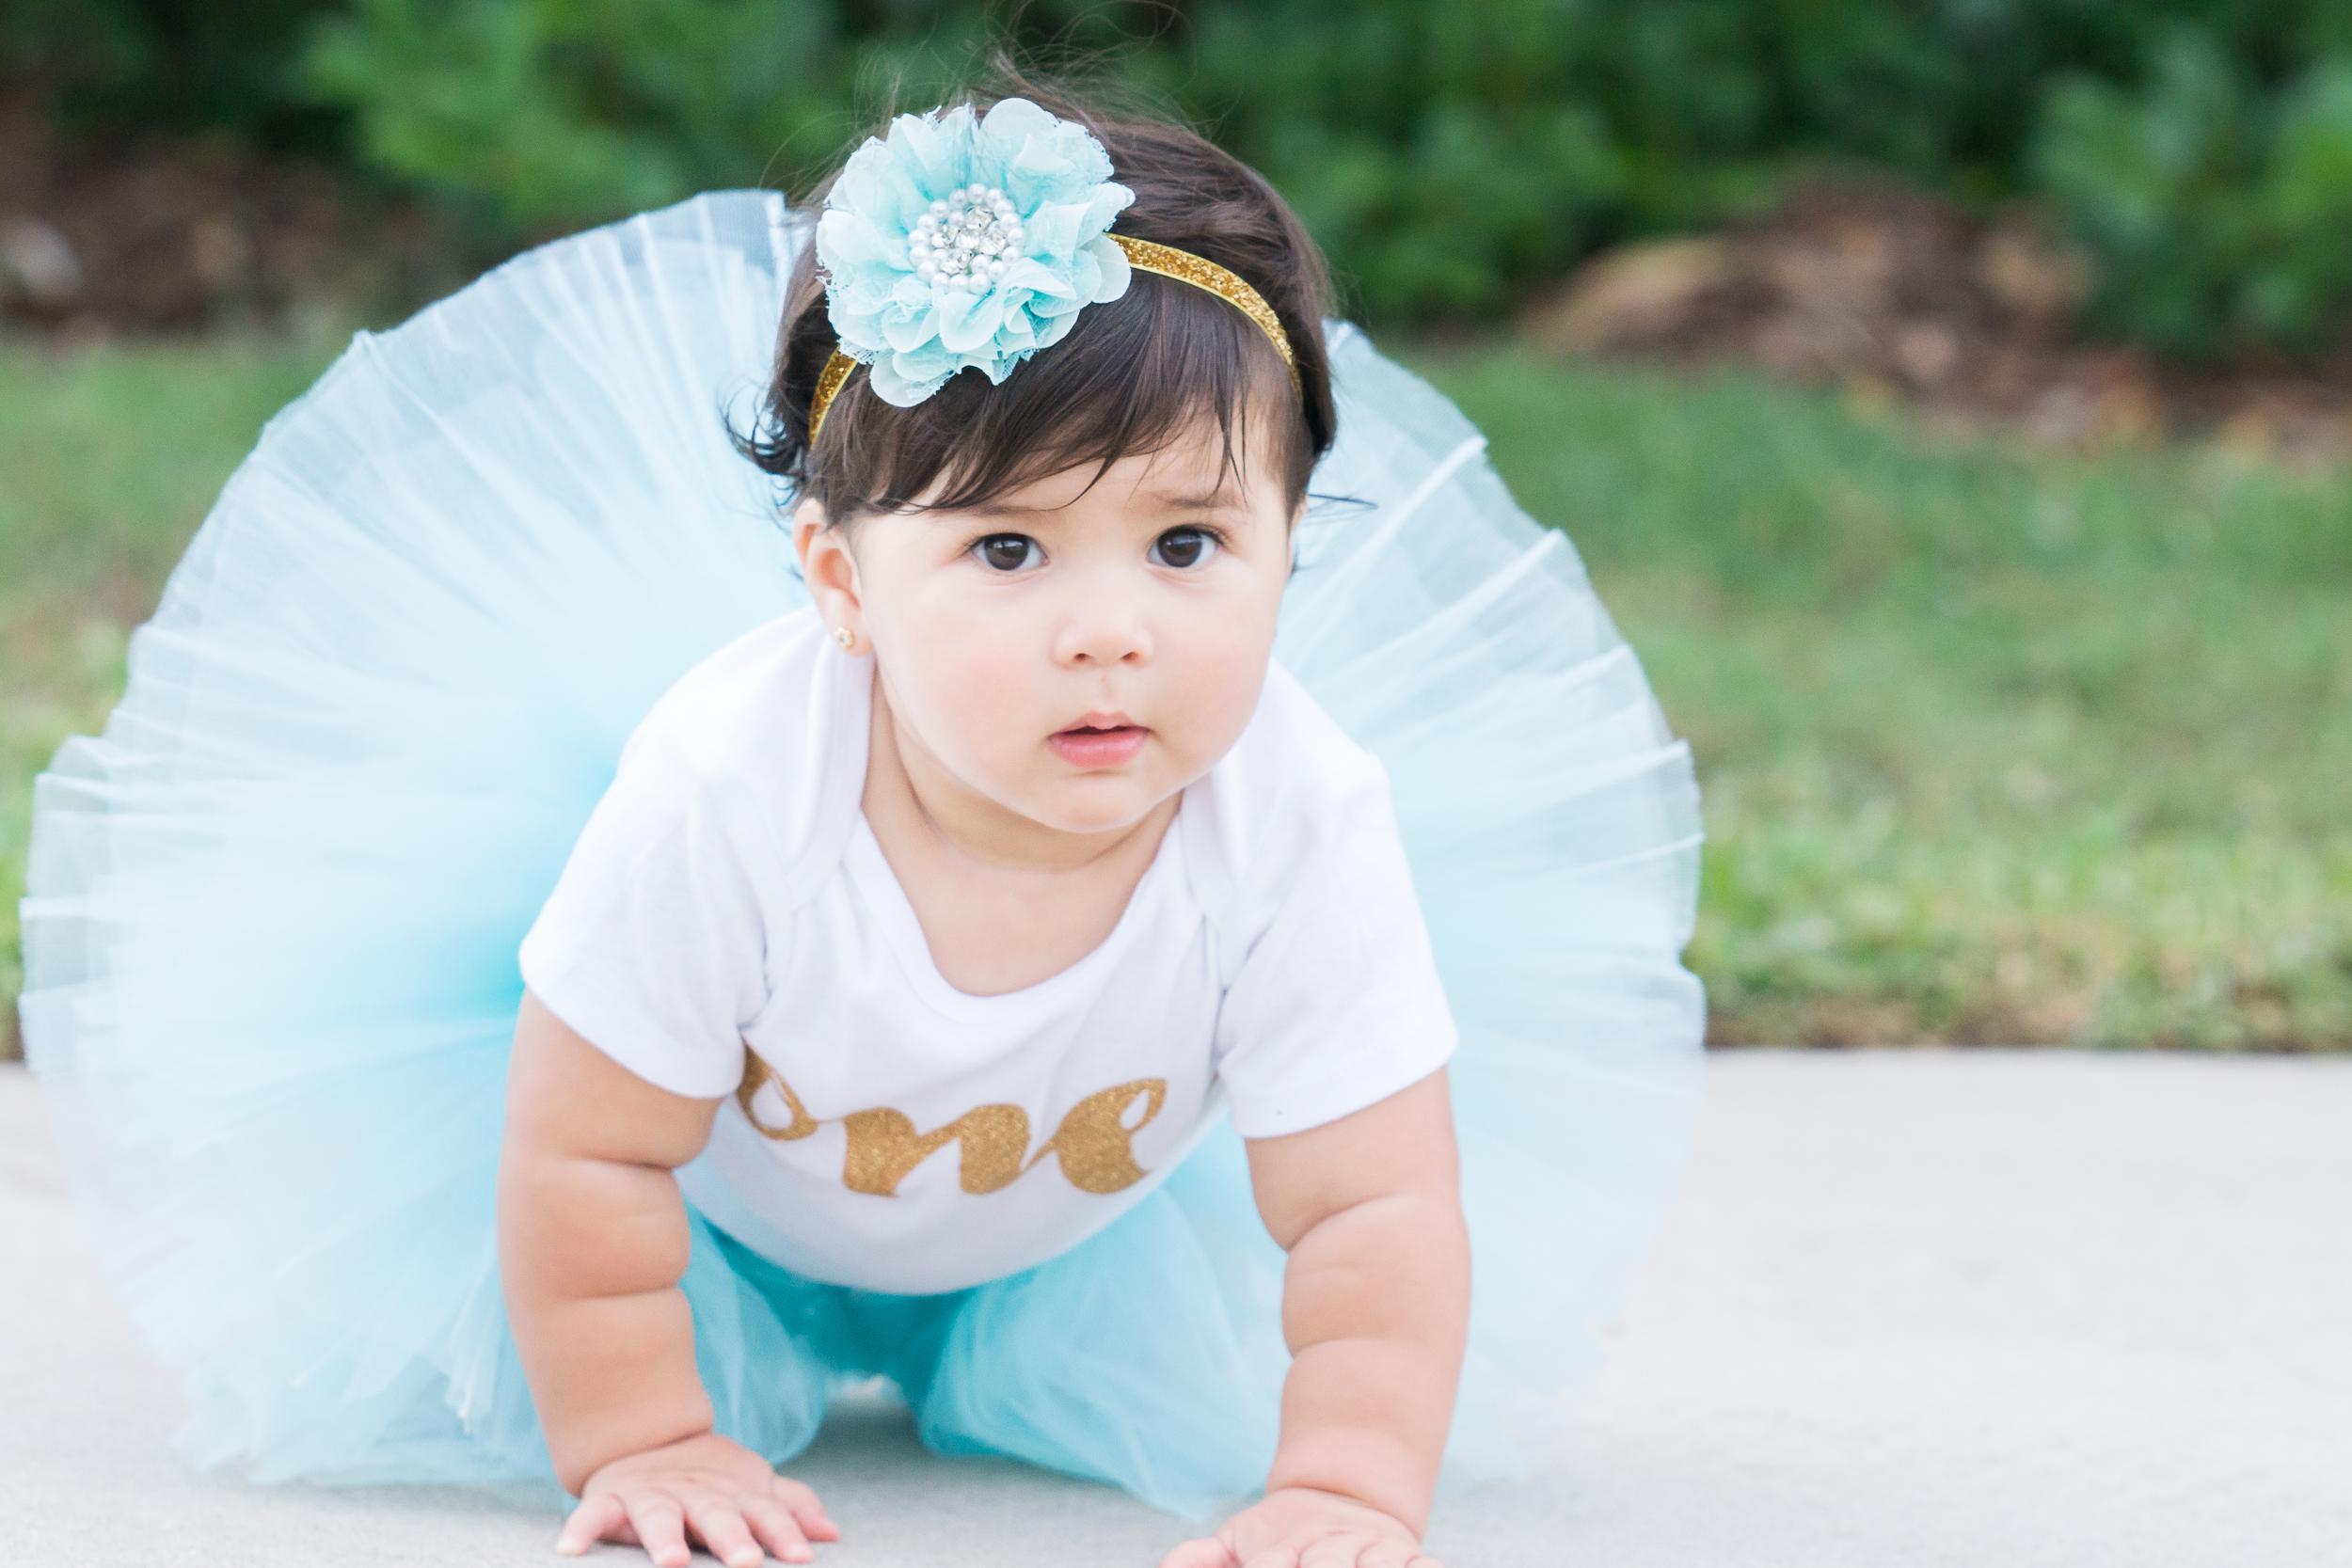 Tampa Photographer | Tampa baby photographer